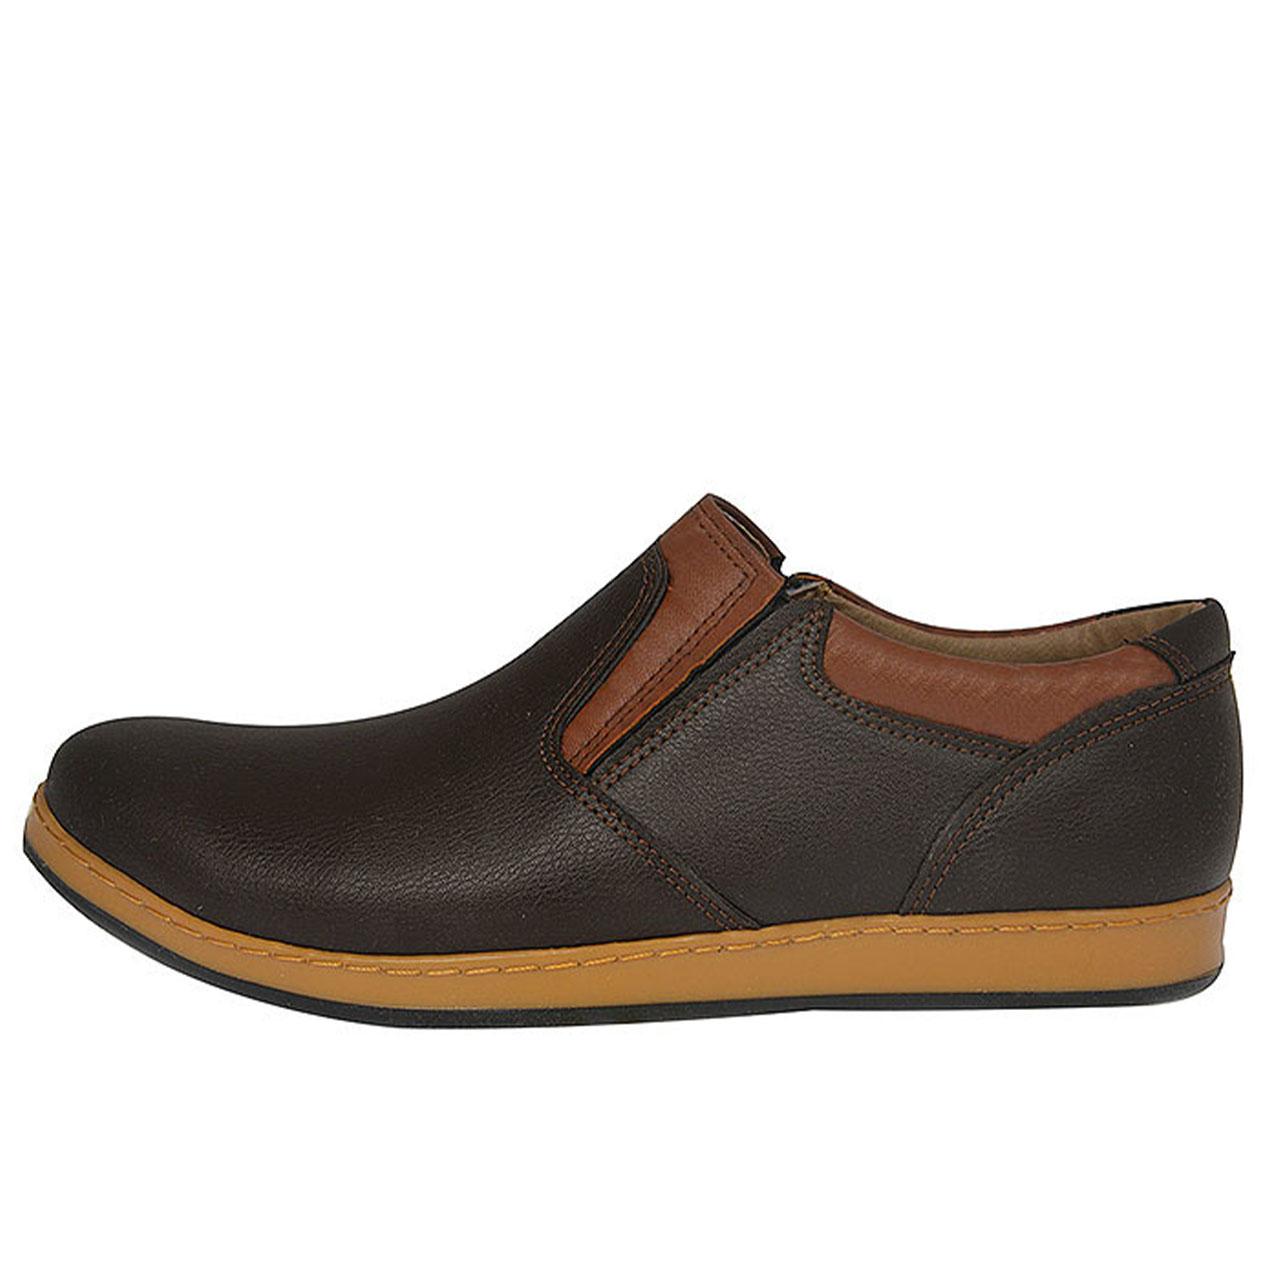 کفش روزمره زنانه کد 324099917